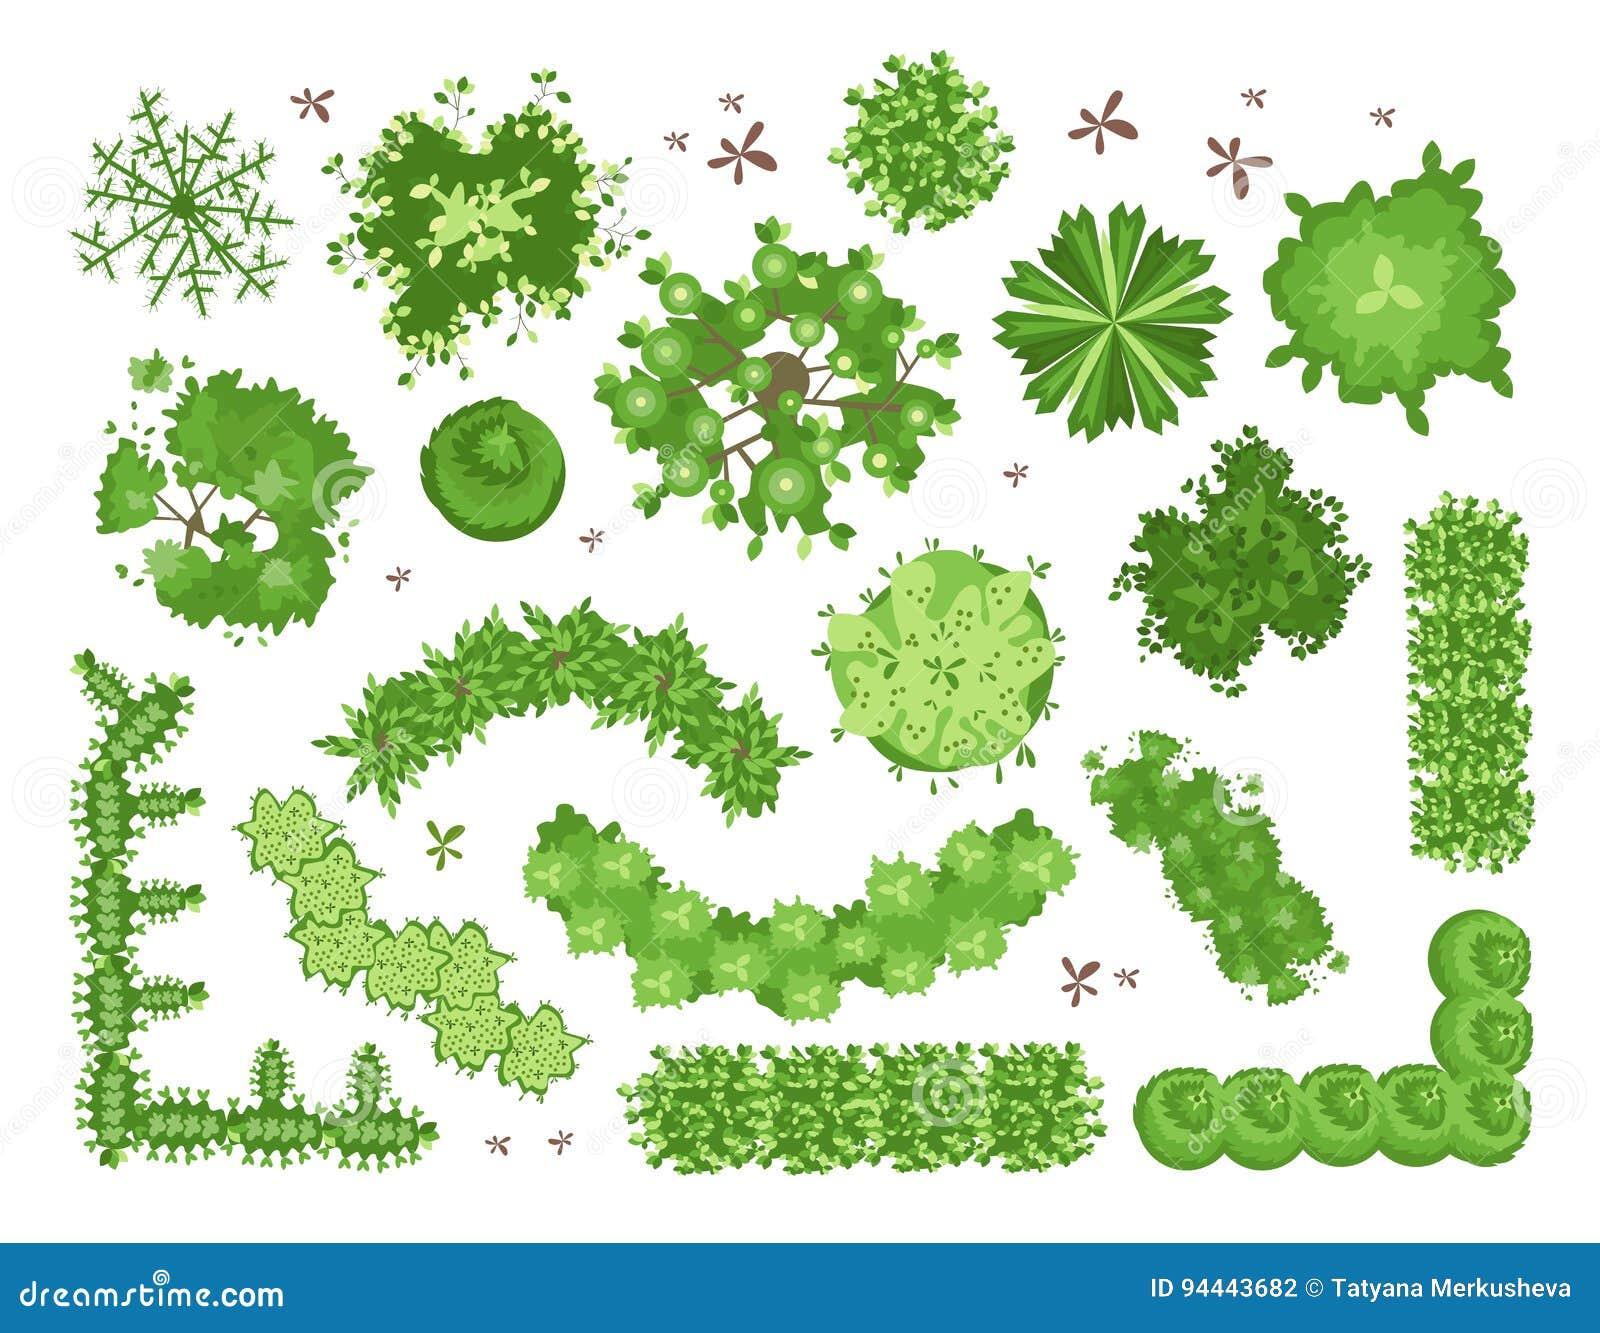 Download Set Of Different Green Trees Shrubs Hedges Top View For Landscape Design